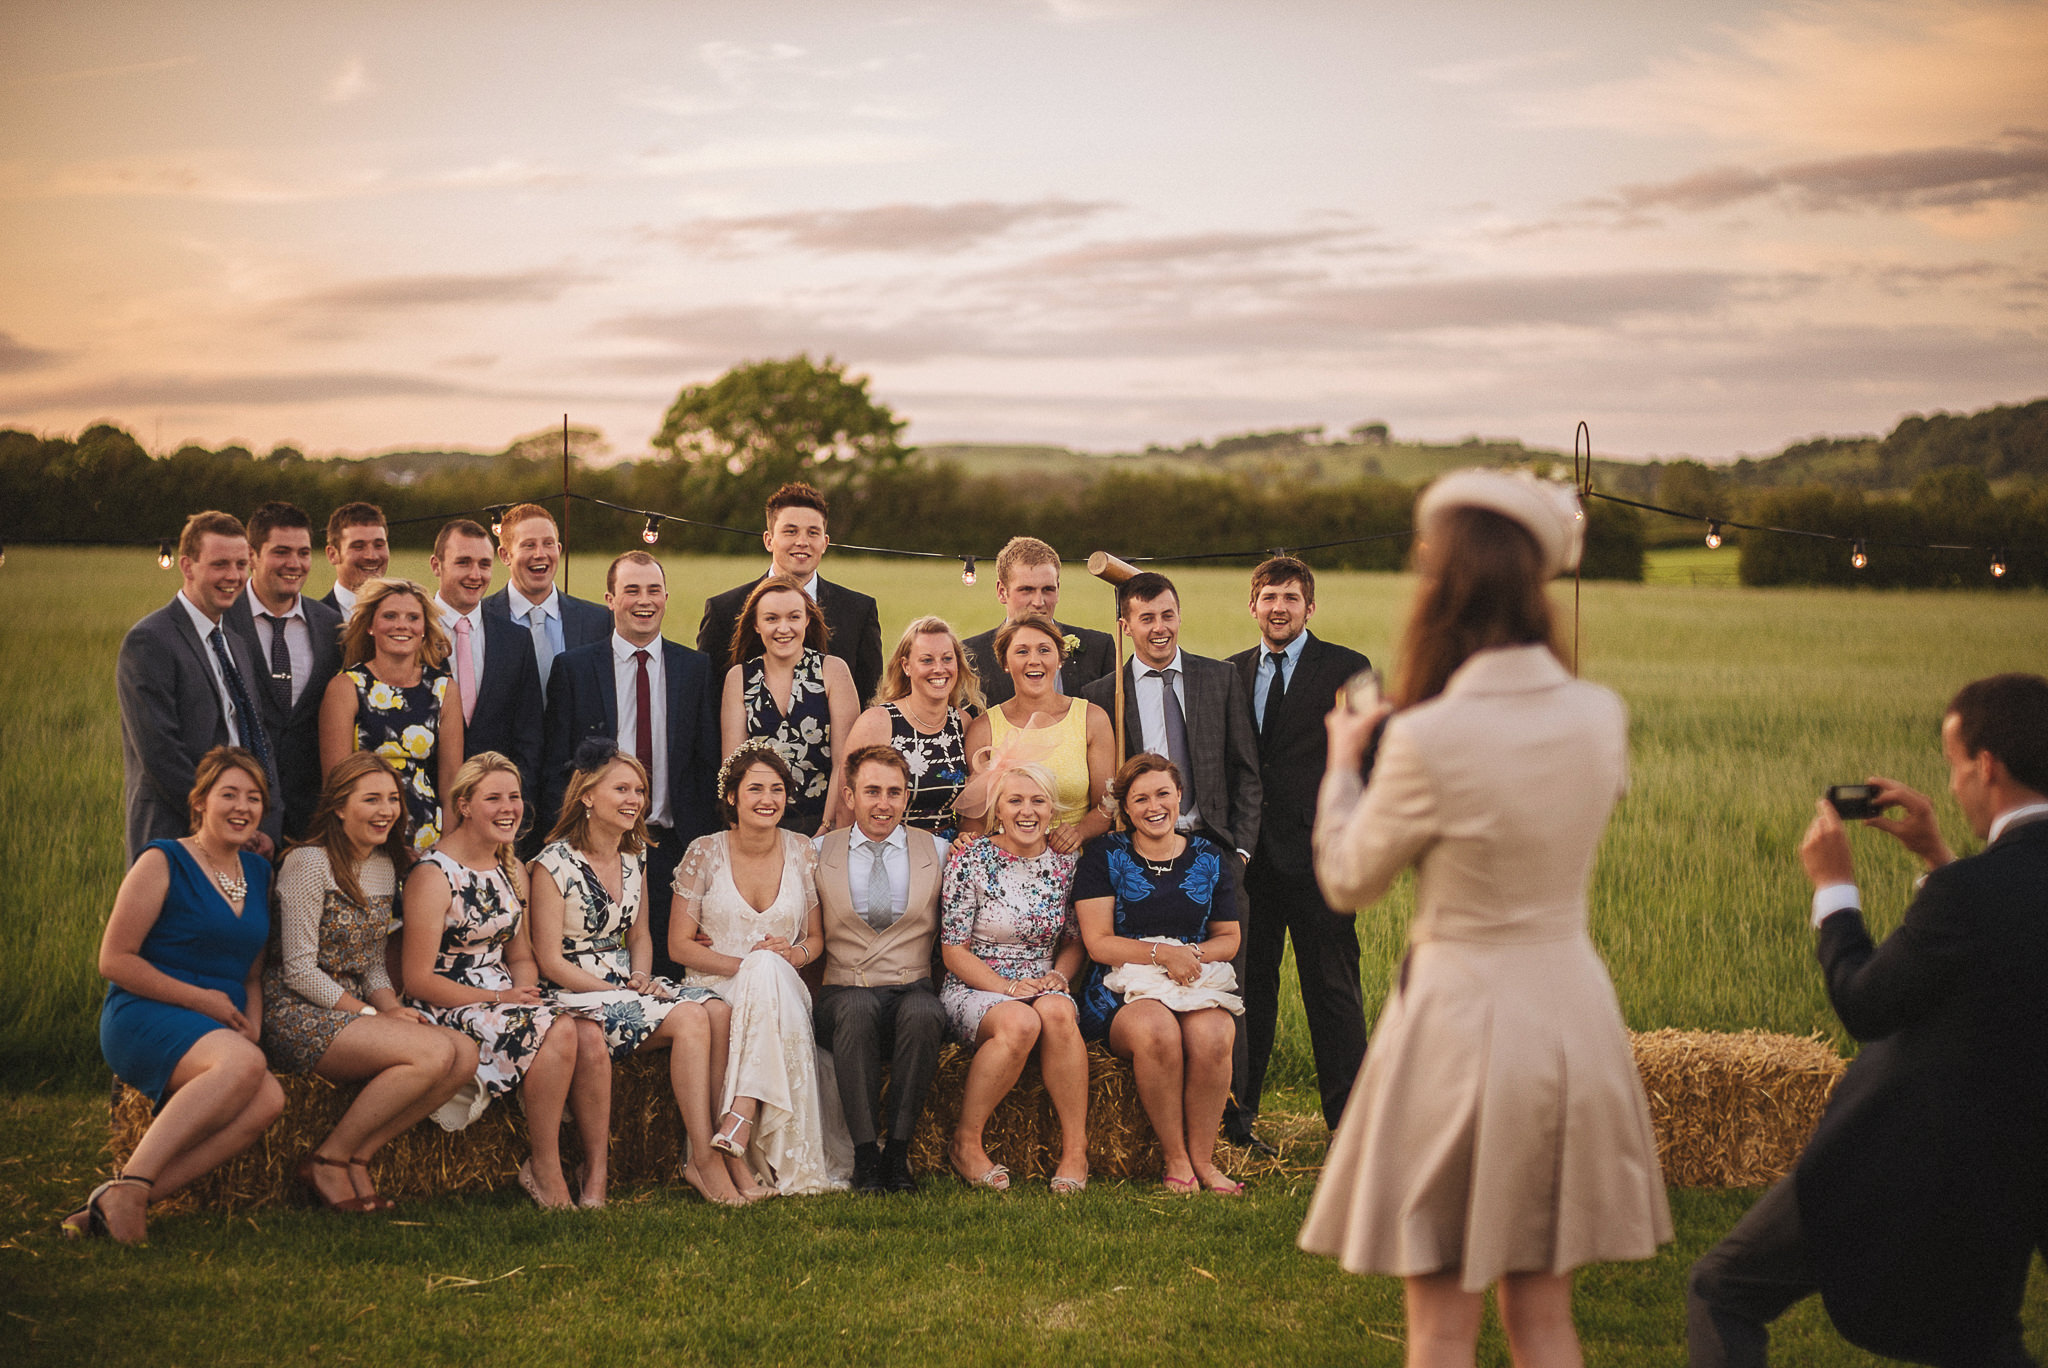 paul-marbrook-Farm-Wedding-Photographer-Lancashire-90085